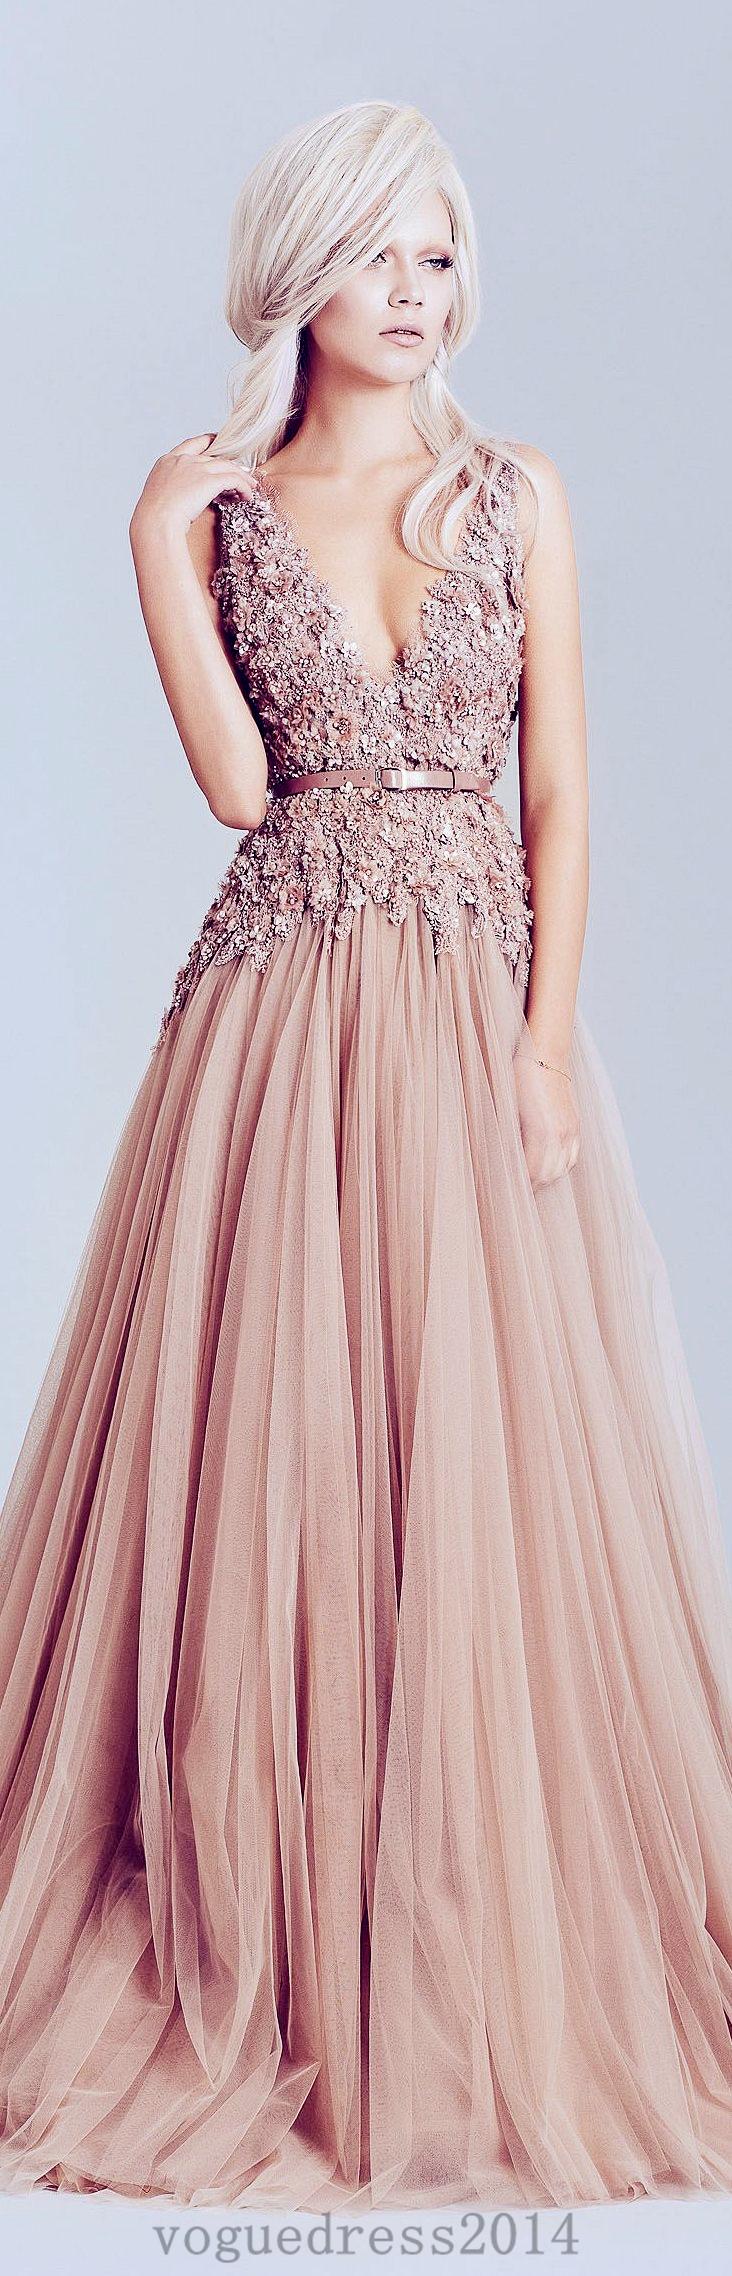 Alfazairy Couture S/S 2016 | Vestidos | Pinterest | Vestiditos ...